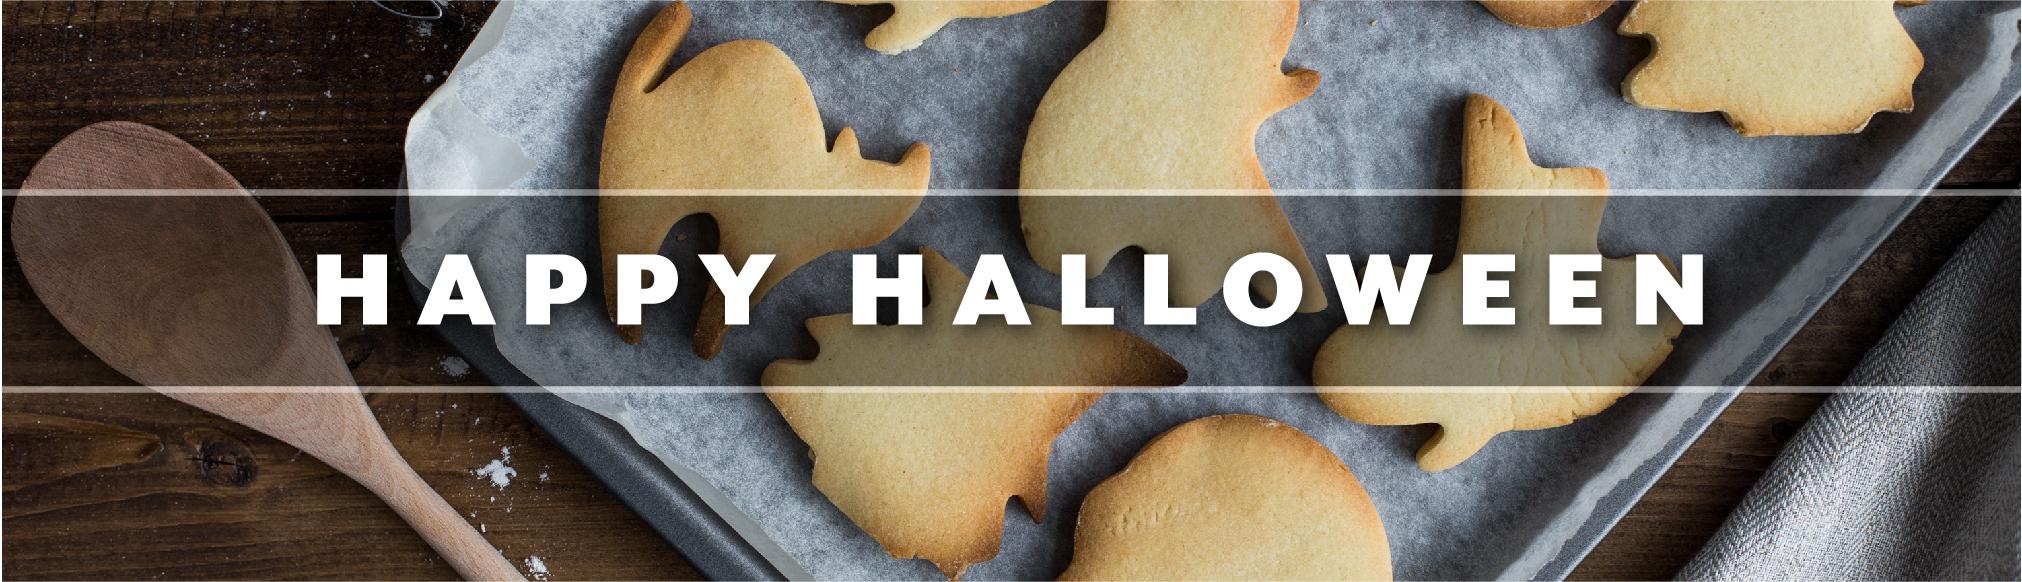 halloween-category-banner-artboard-1.jpg